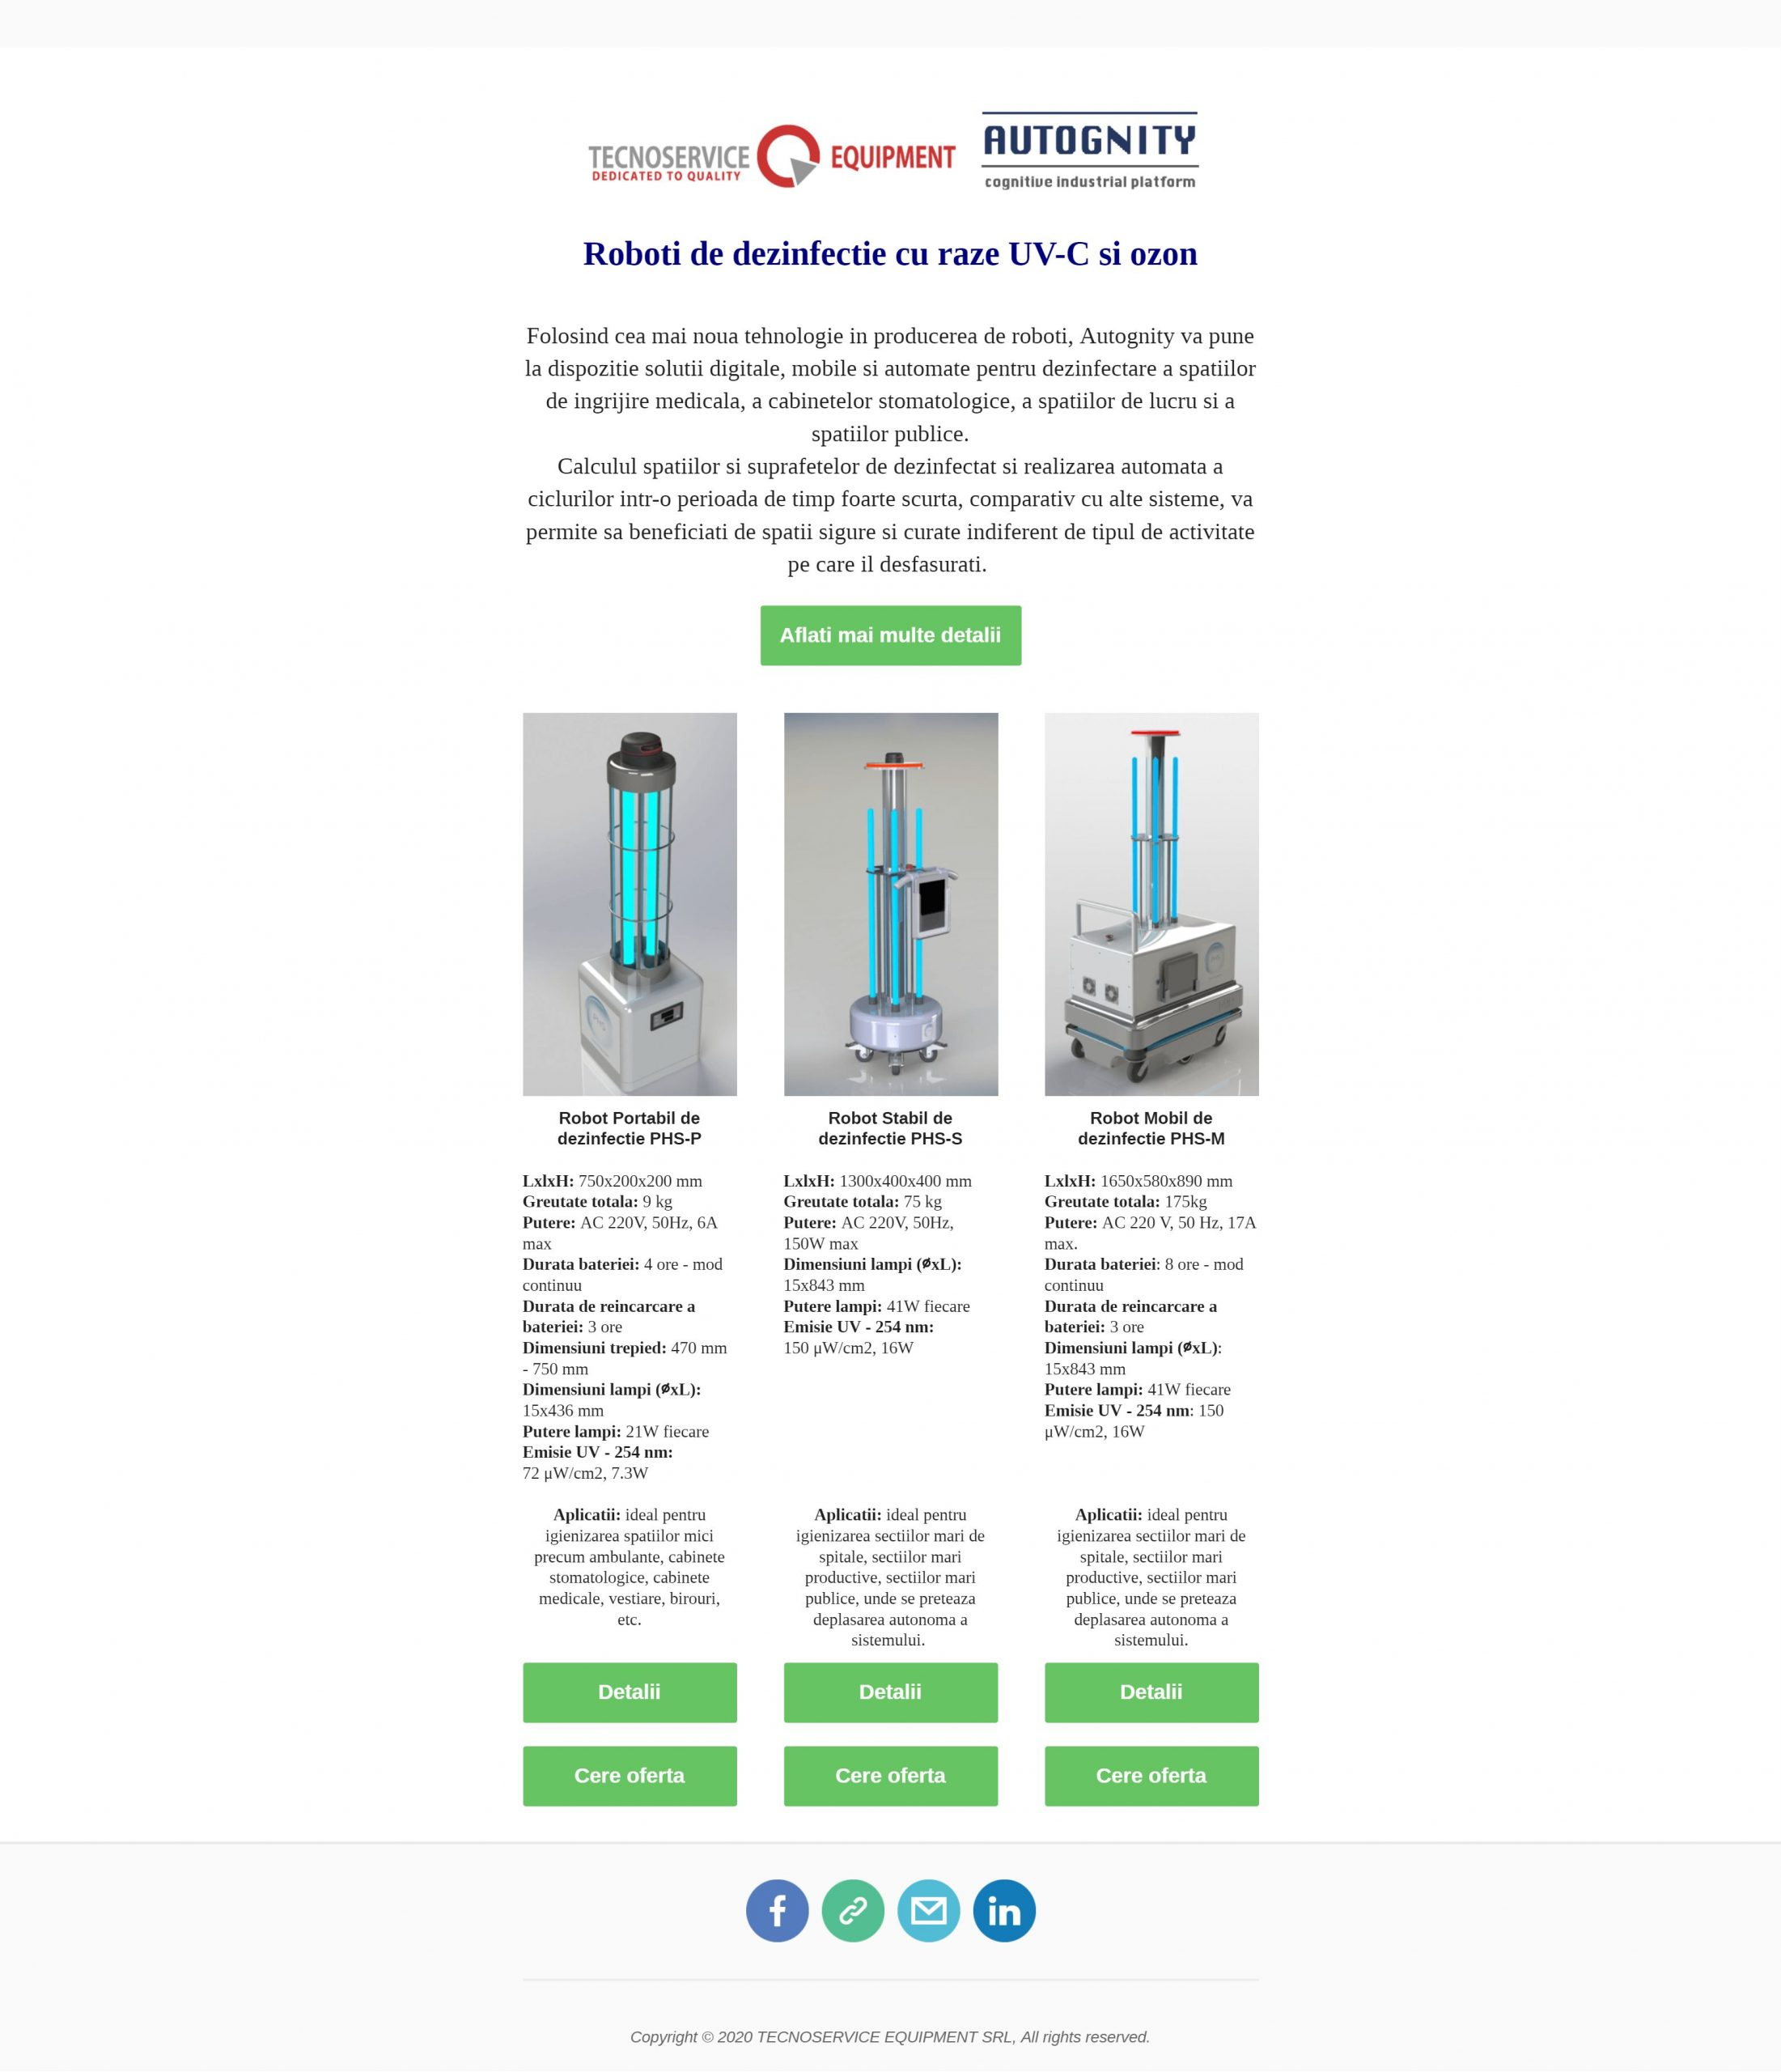 Roboti dezinfectie UV-C UVGI raze ultraviolete ozon spitale dezinfectare coronavirus covid sars tecnoservice romania phs lampa uv lampi